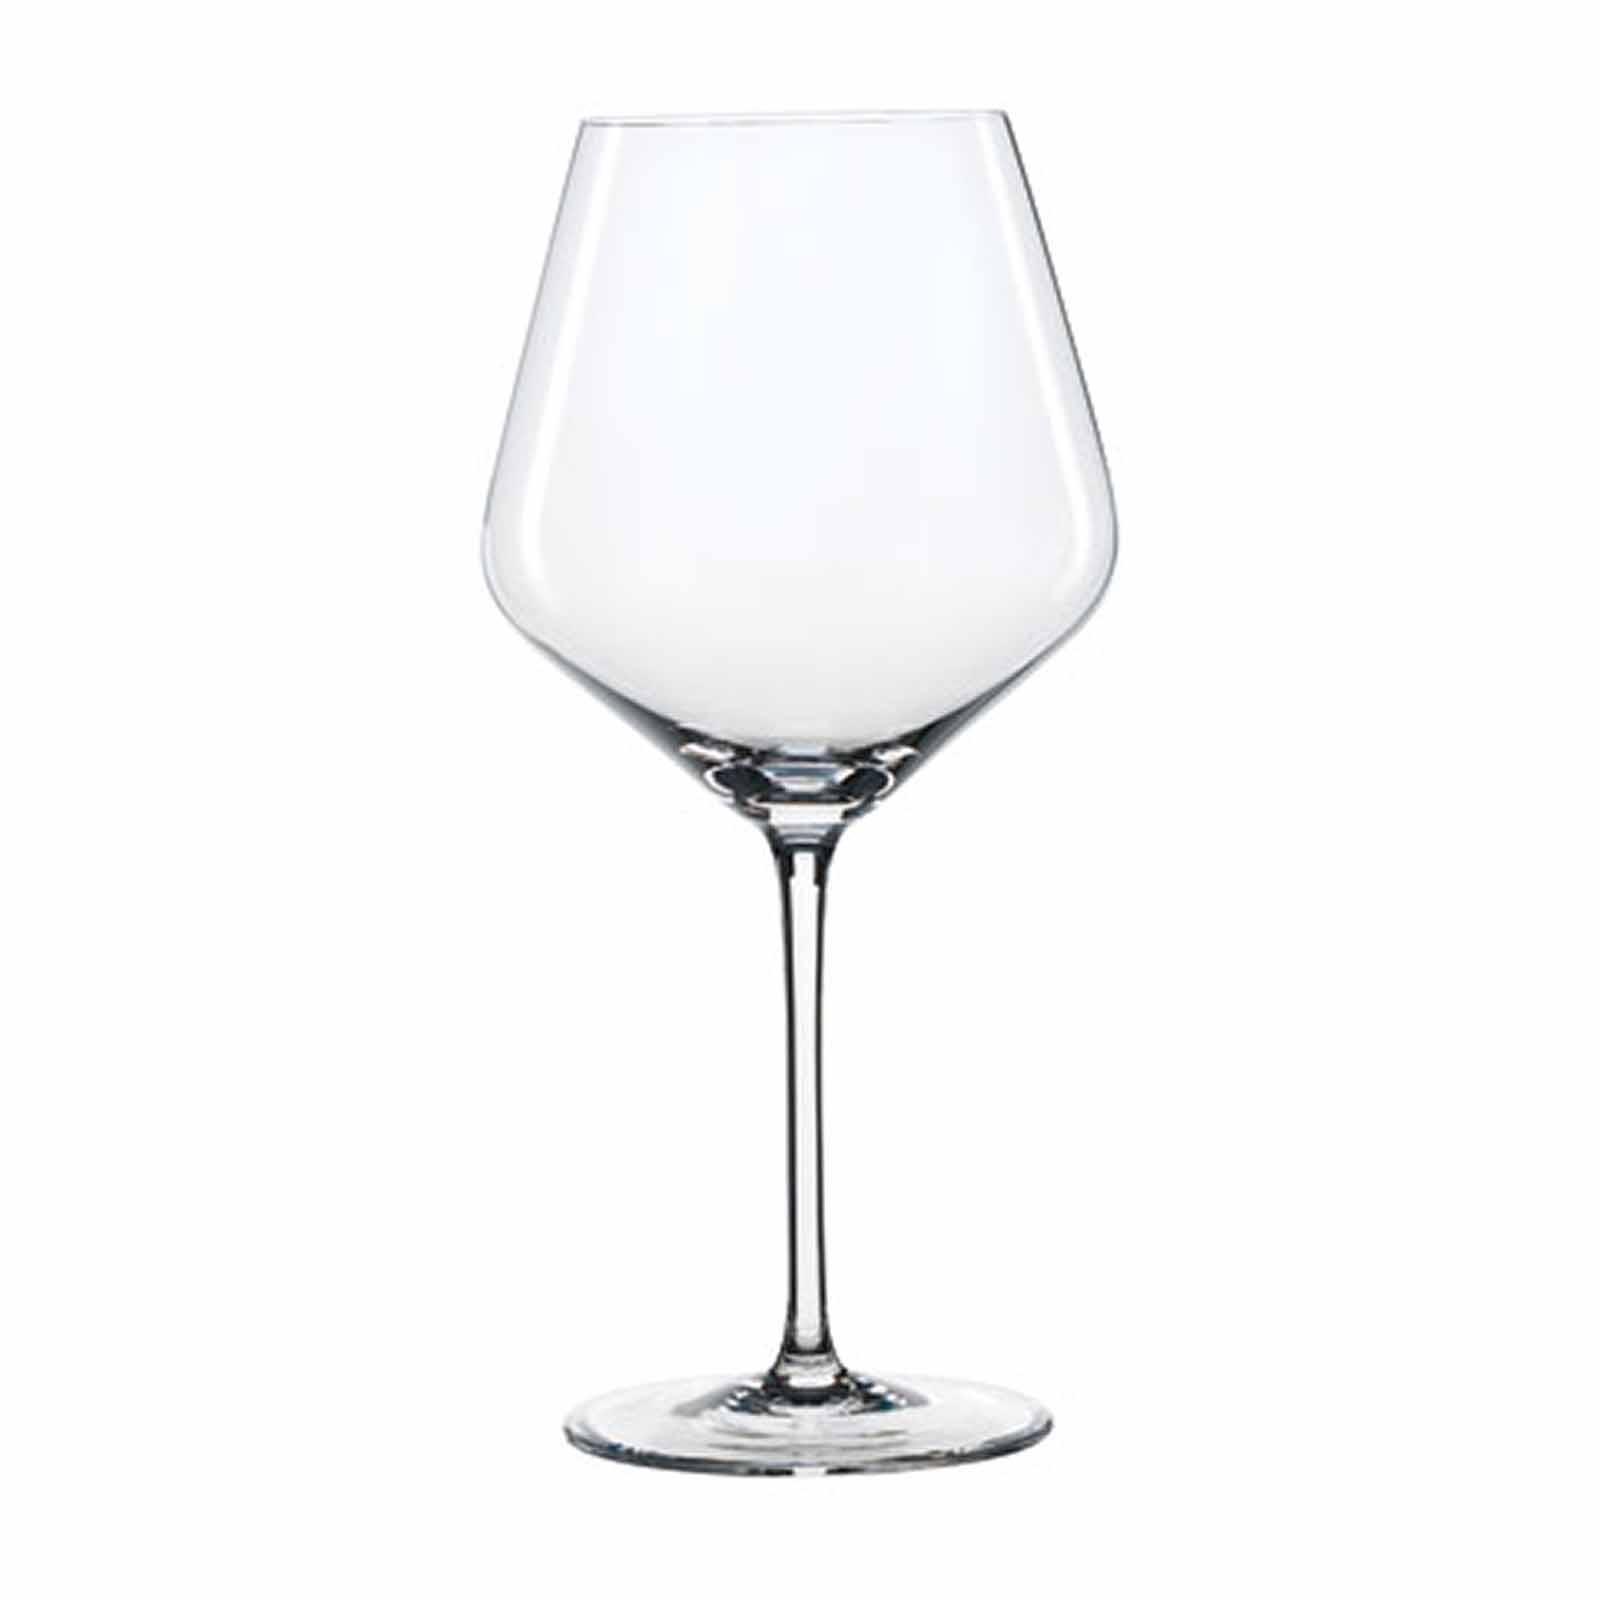 Spiegelau Set Of 4 640Ml Burgundy Glass 10.7Xh22.5Cm-Style - By ToTT